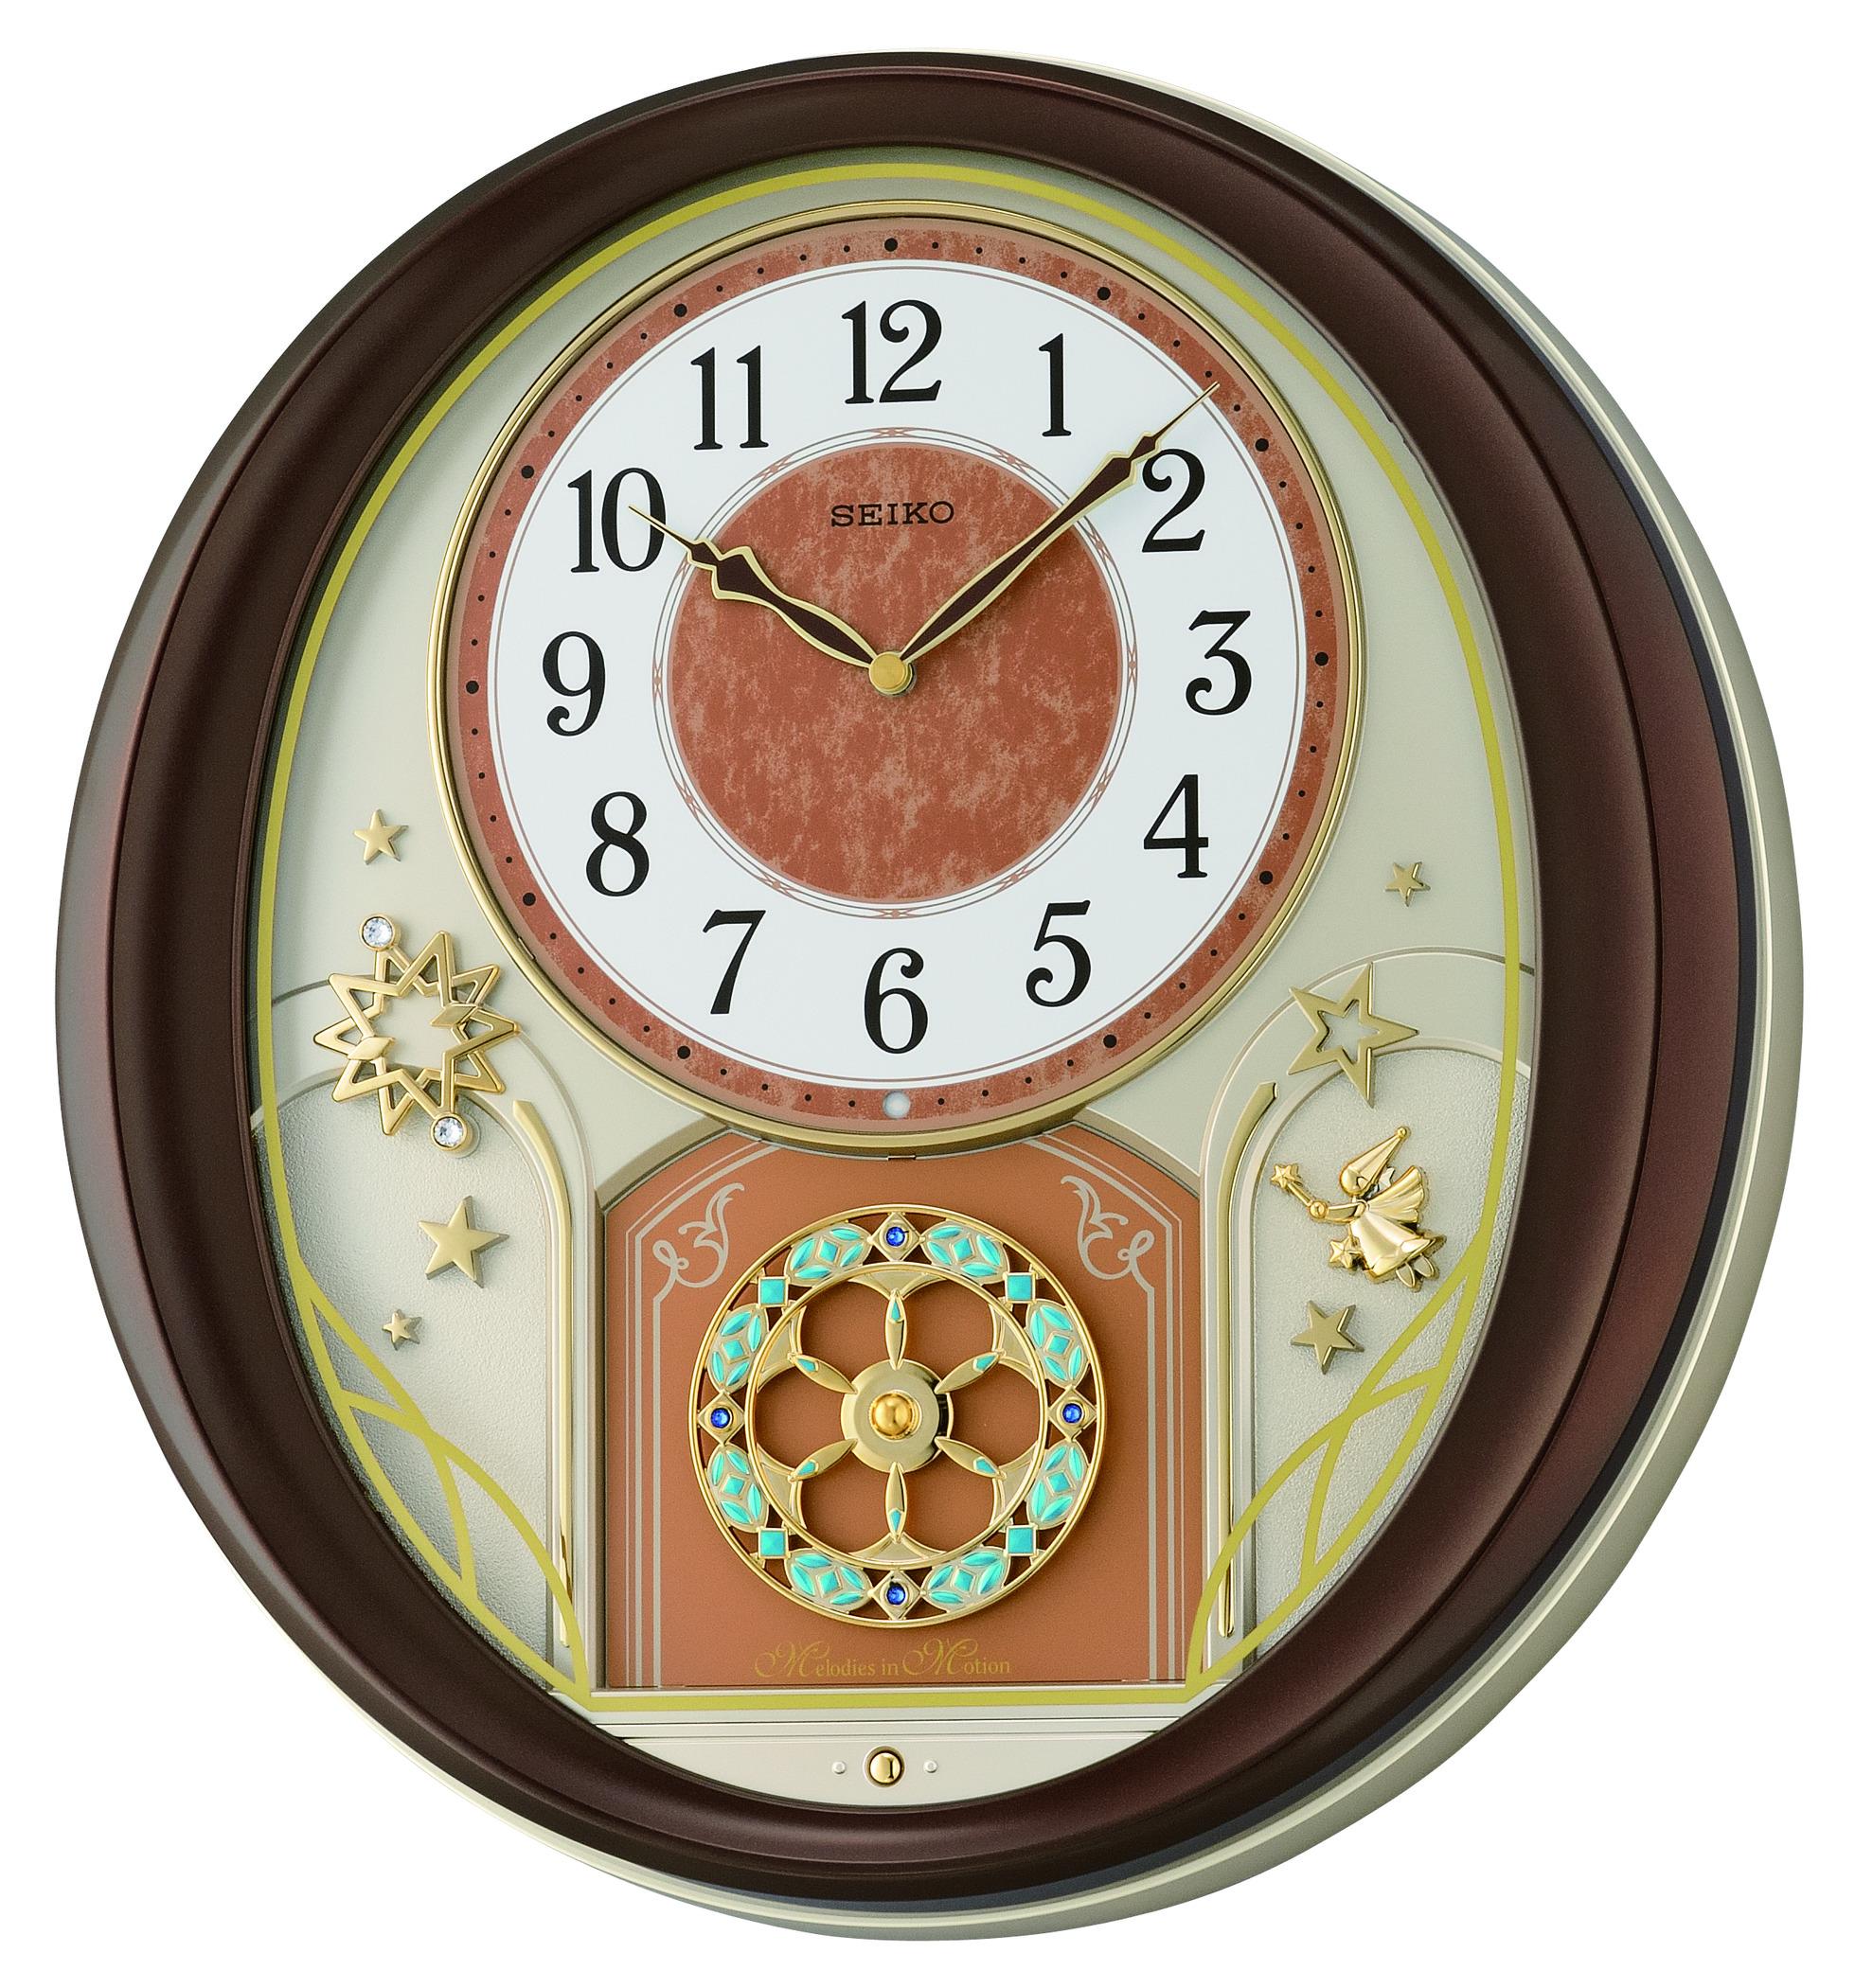 Seiko philomena qxm553brh springfield clock shop seiko philomena qxm553brh amipublicfo Images